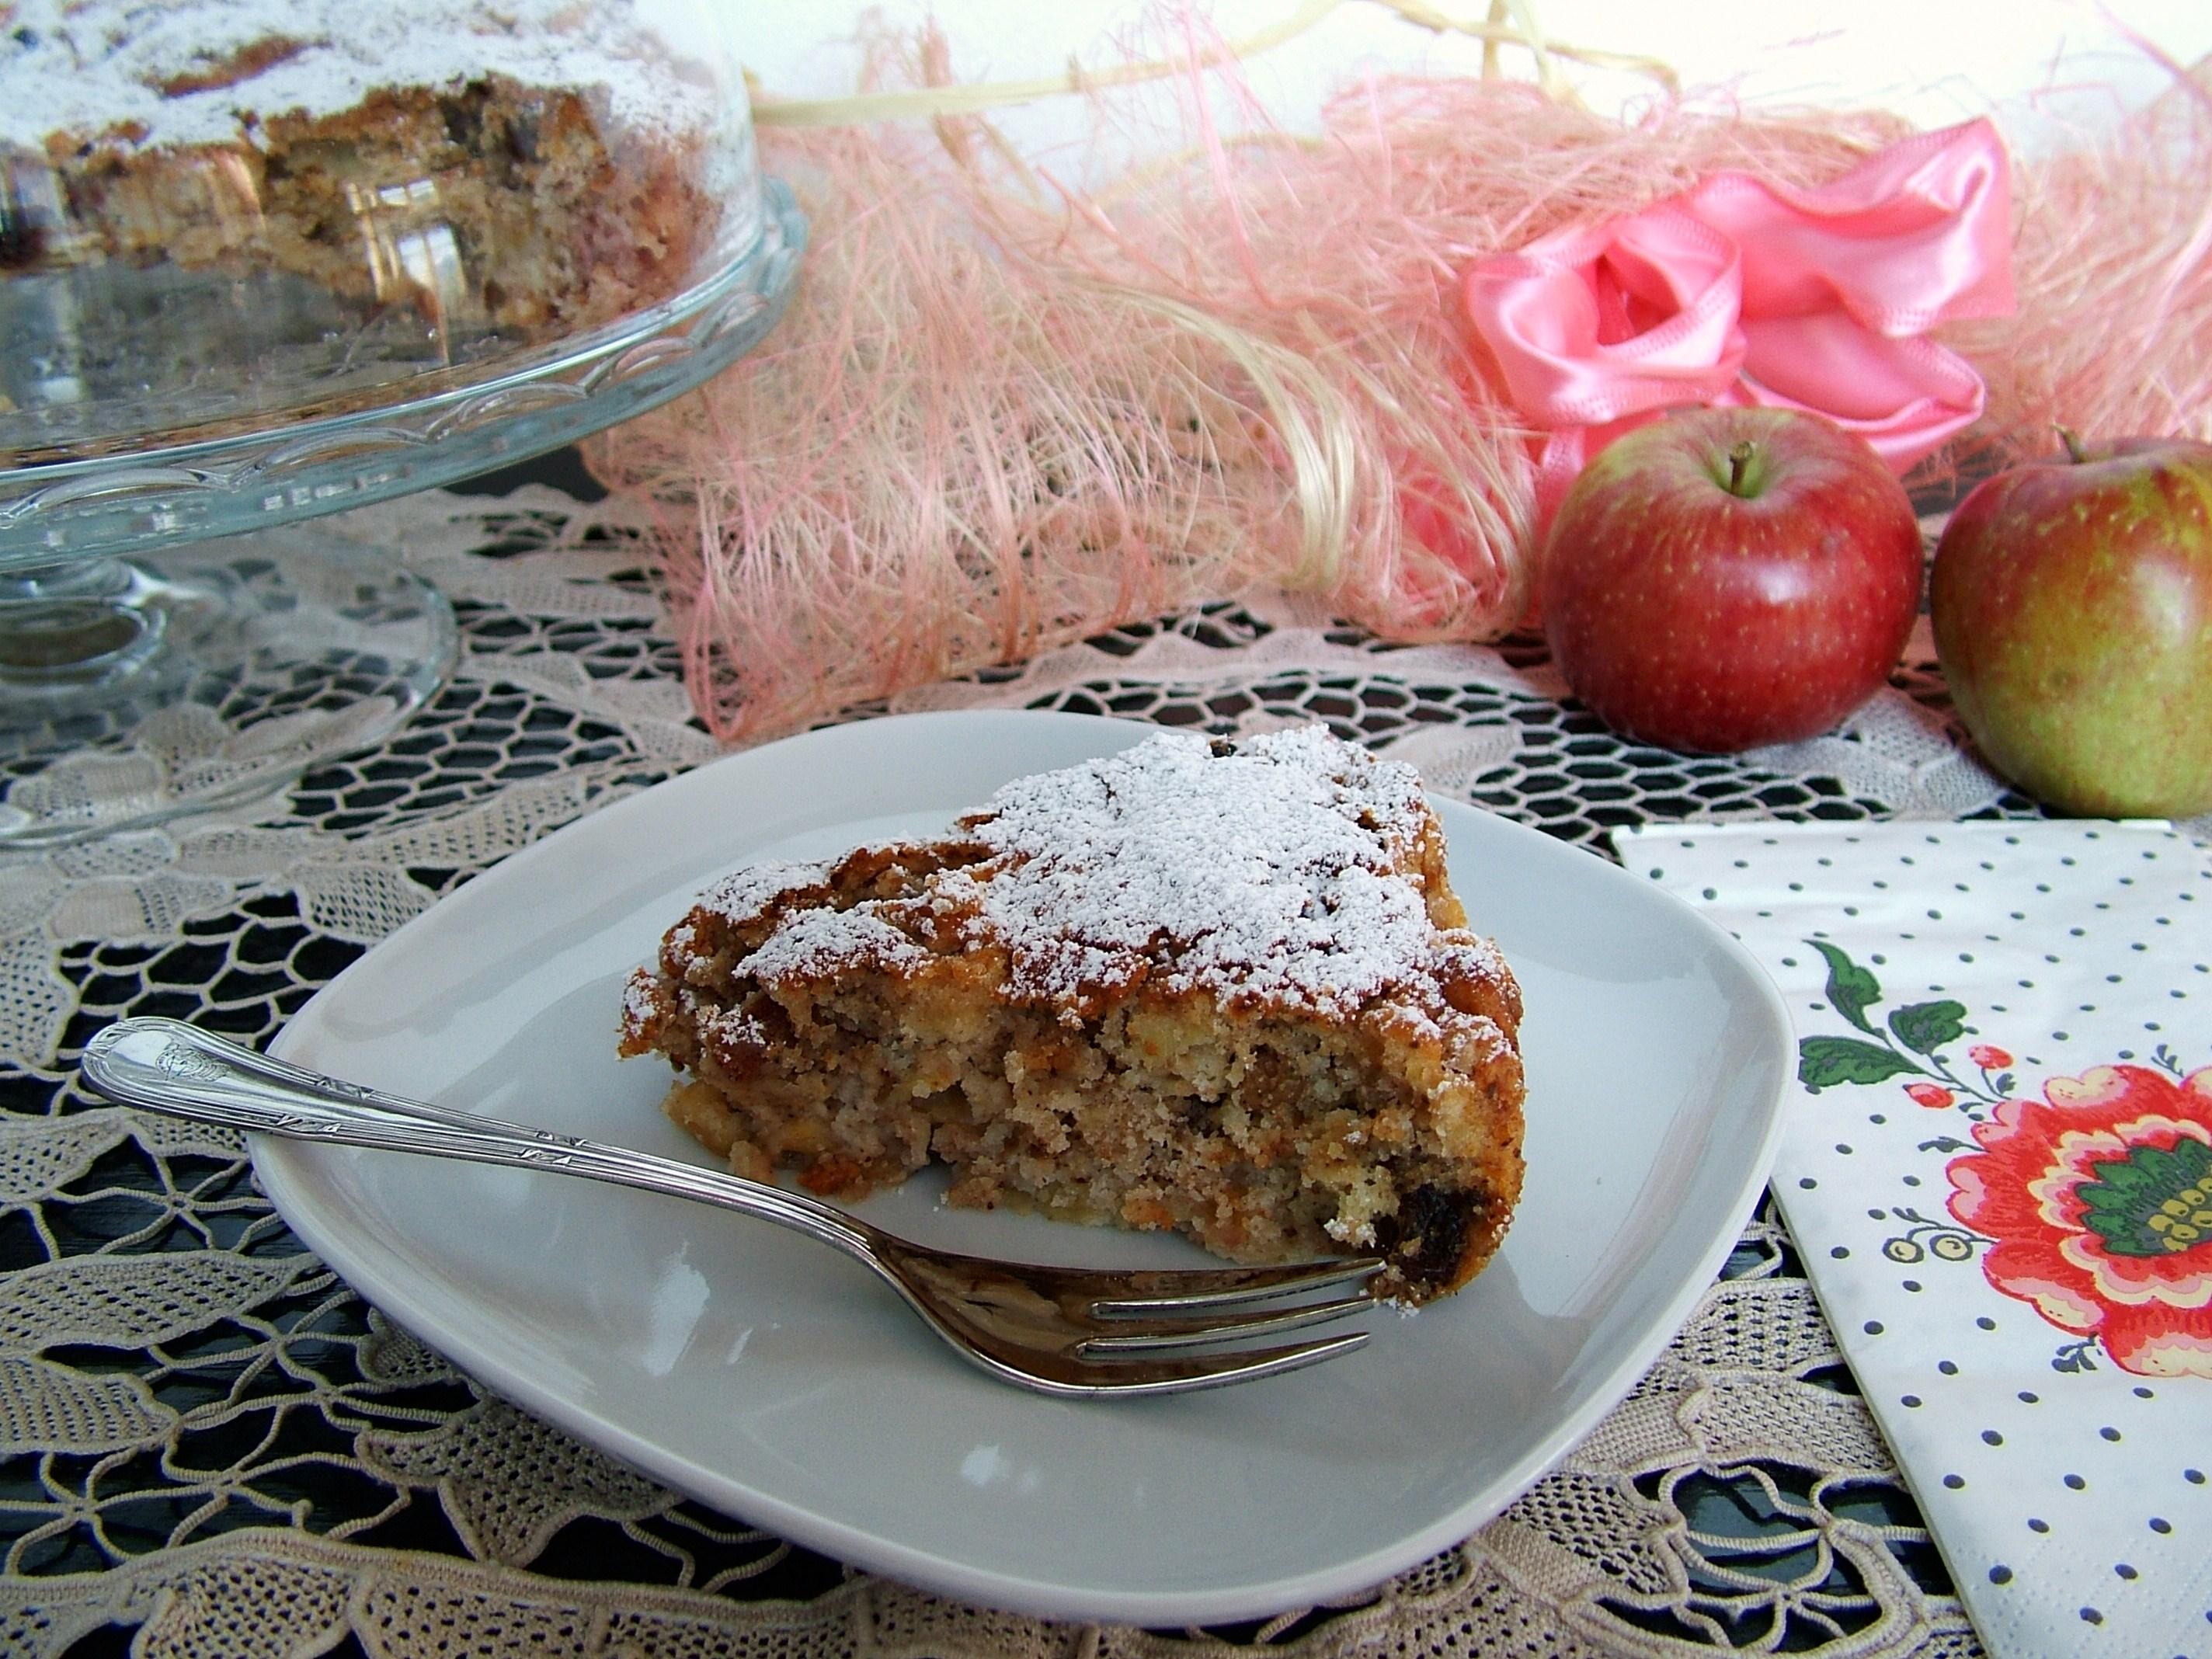 Torta speziata con mele, uvetta e noci